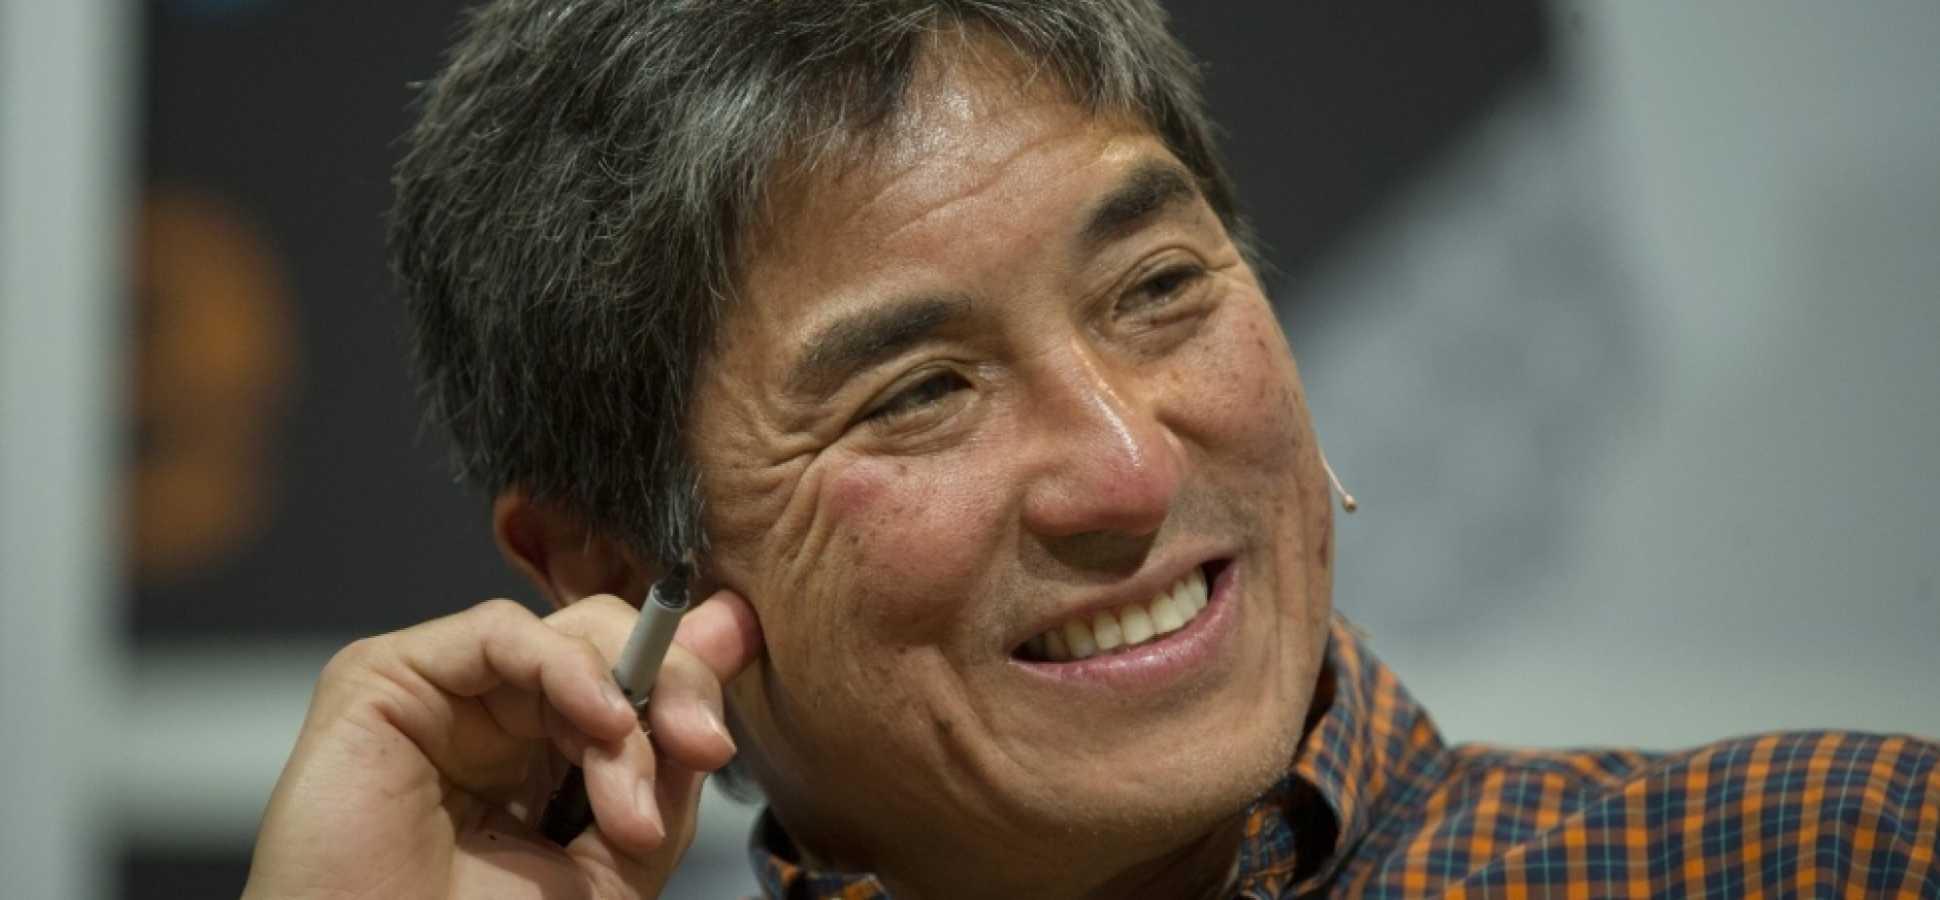 5 Powerful Speaking Secrets You Can Learn From Guy Kawasaki